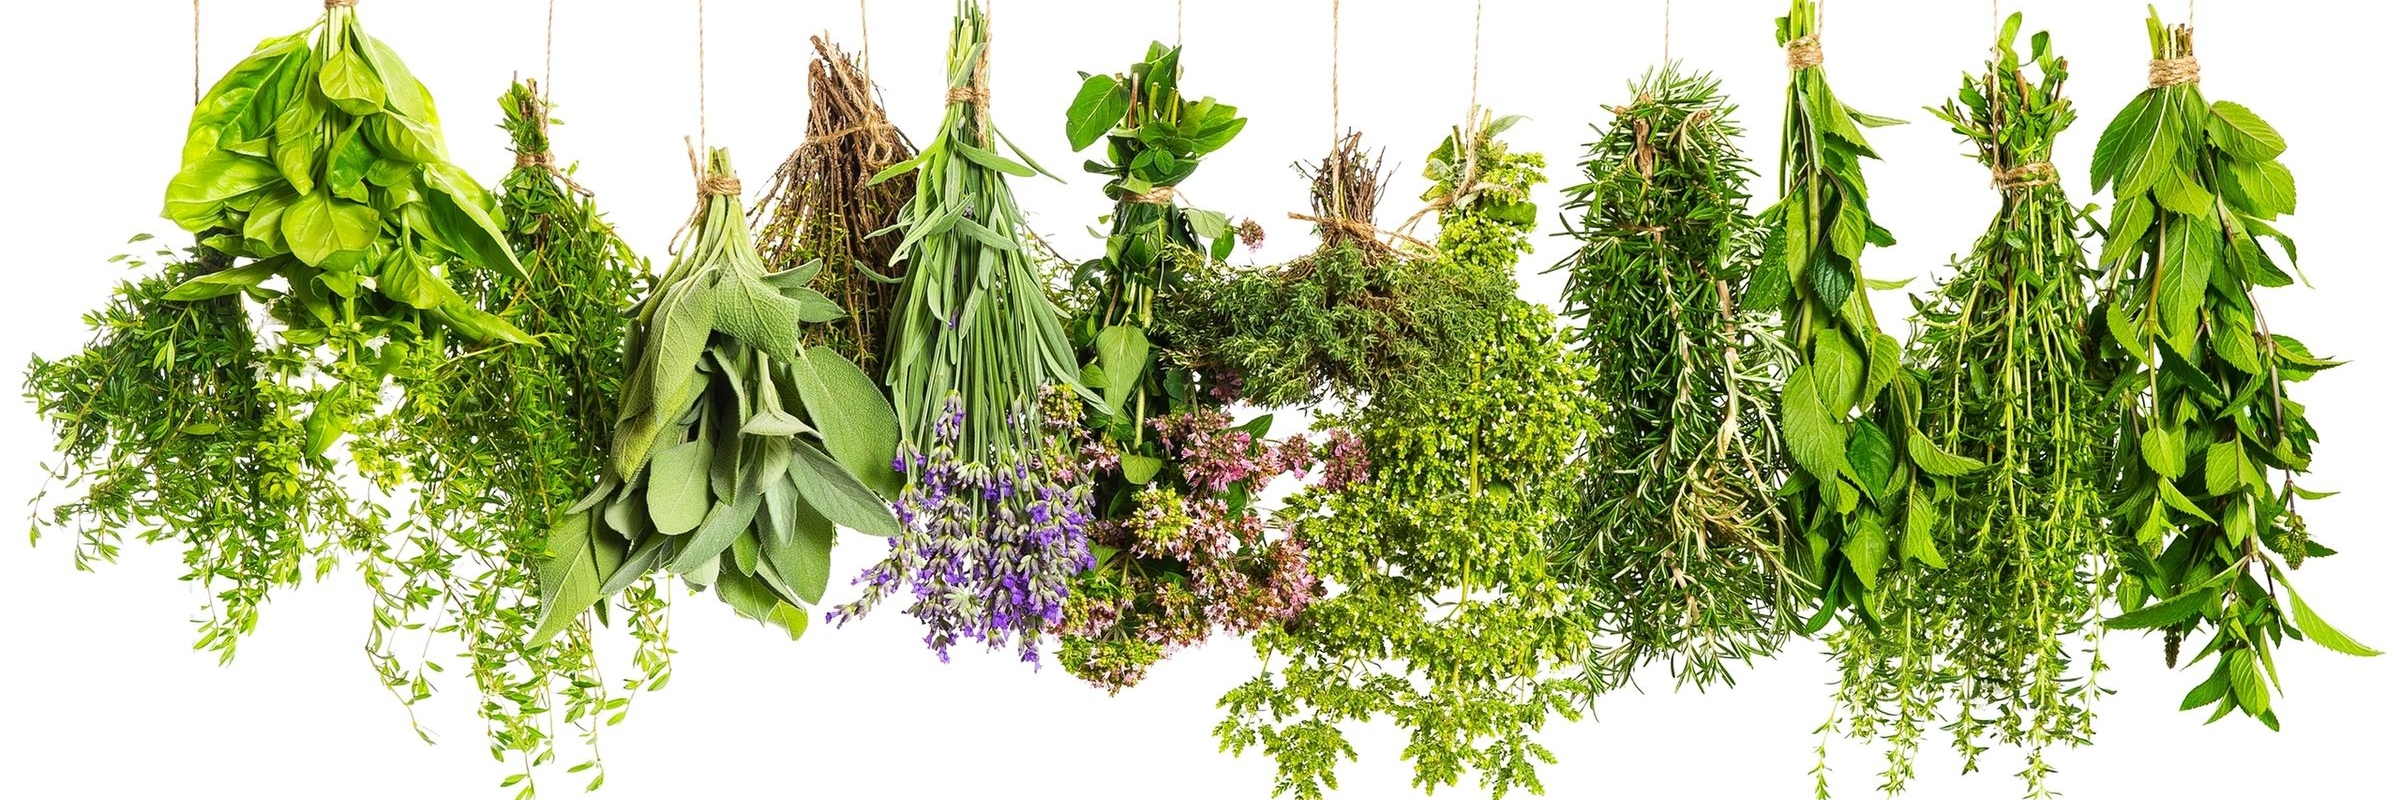 Inspiration Essential Oils - Discover the natural power of essential oils